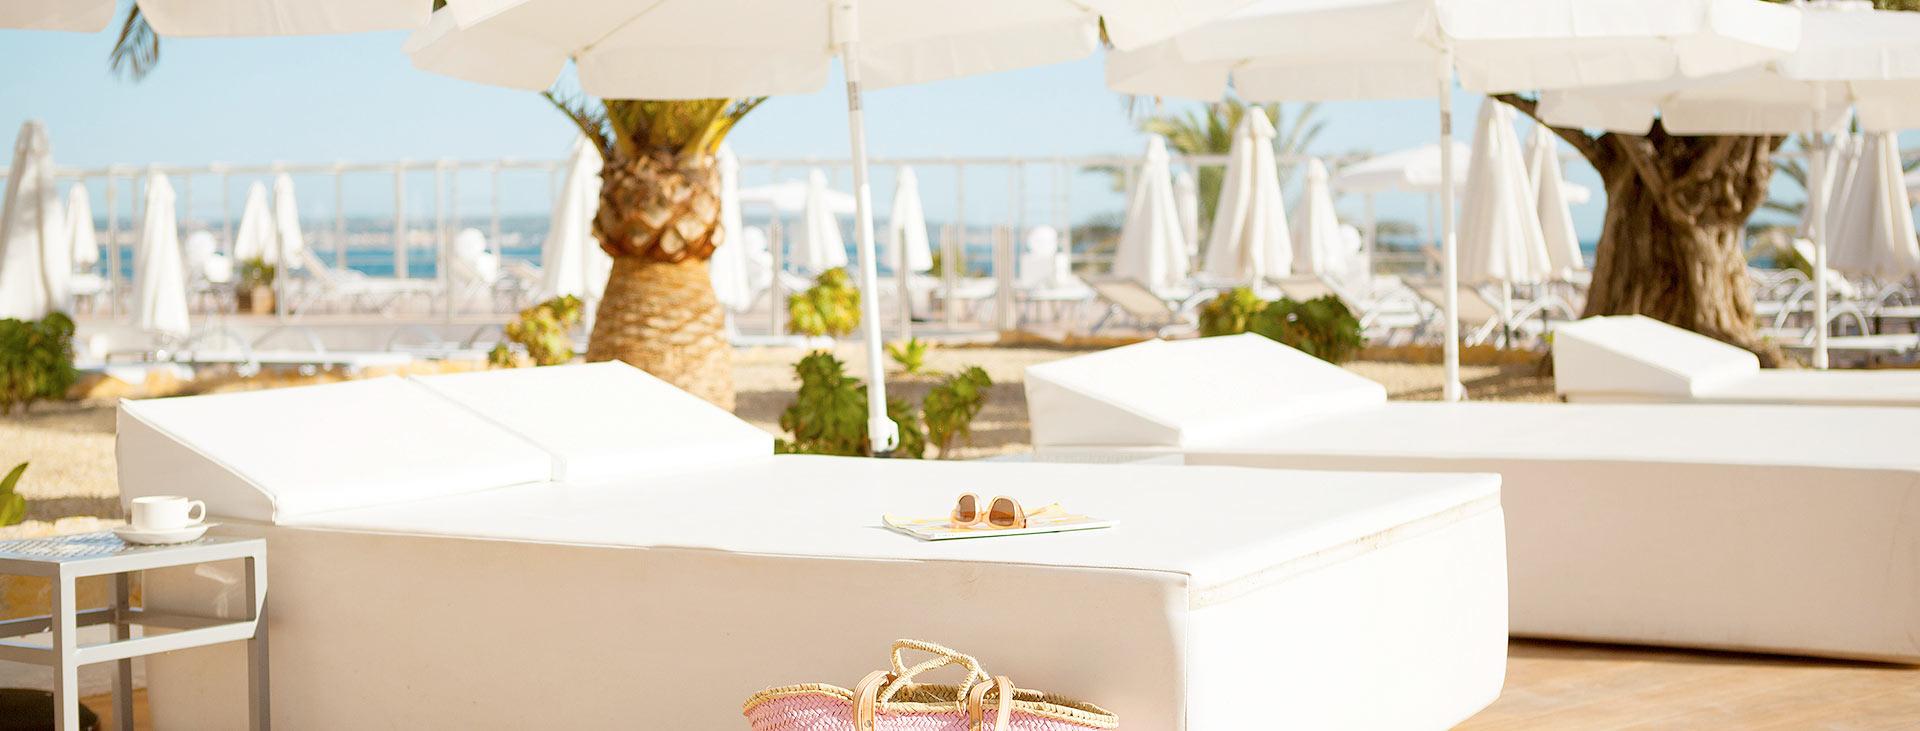 Sunprime Waterfront, Playa de Palma, Mallorca, Espanja